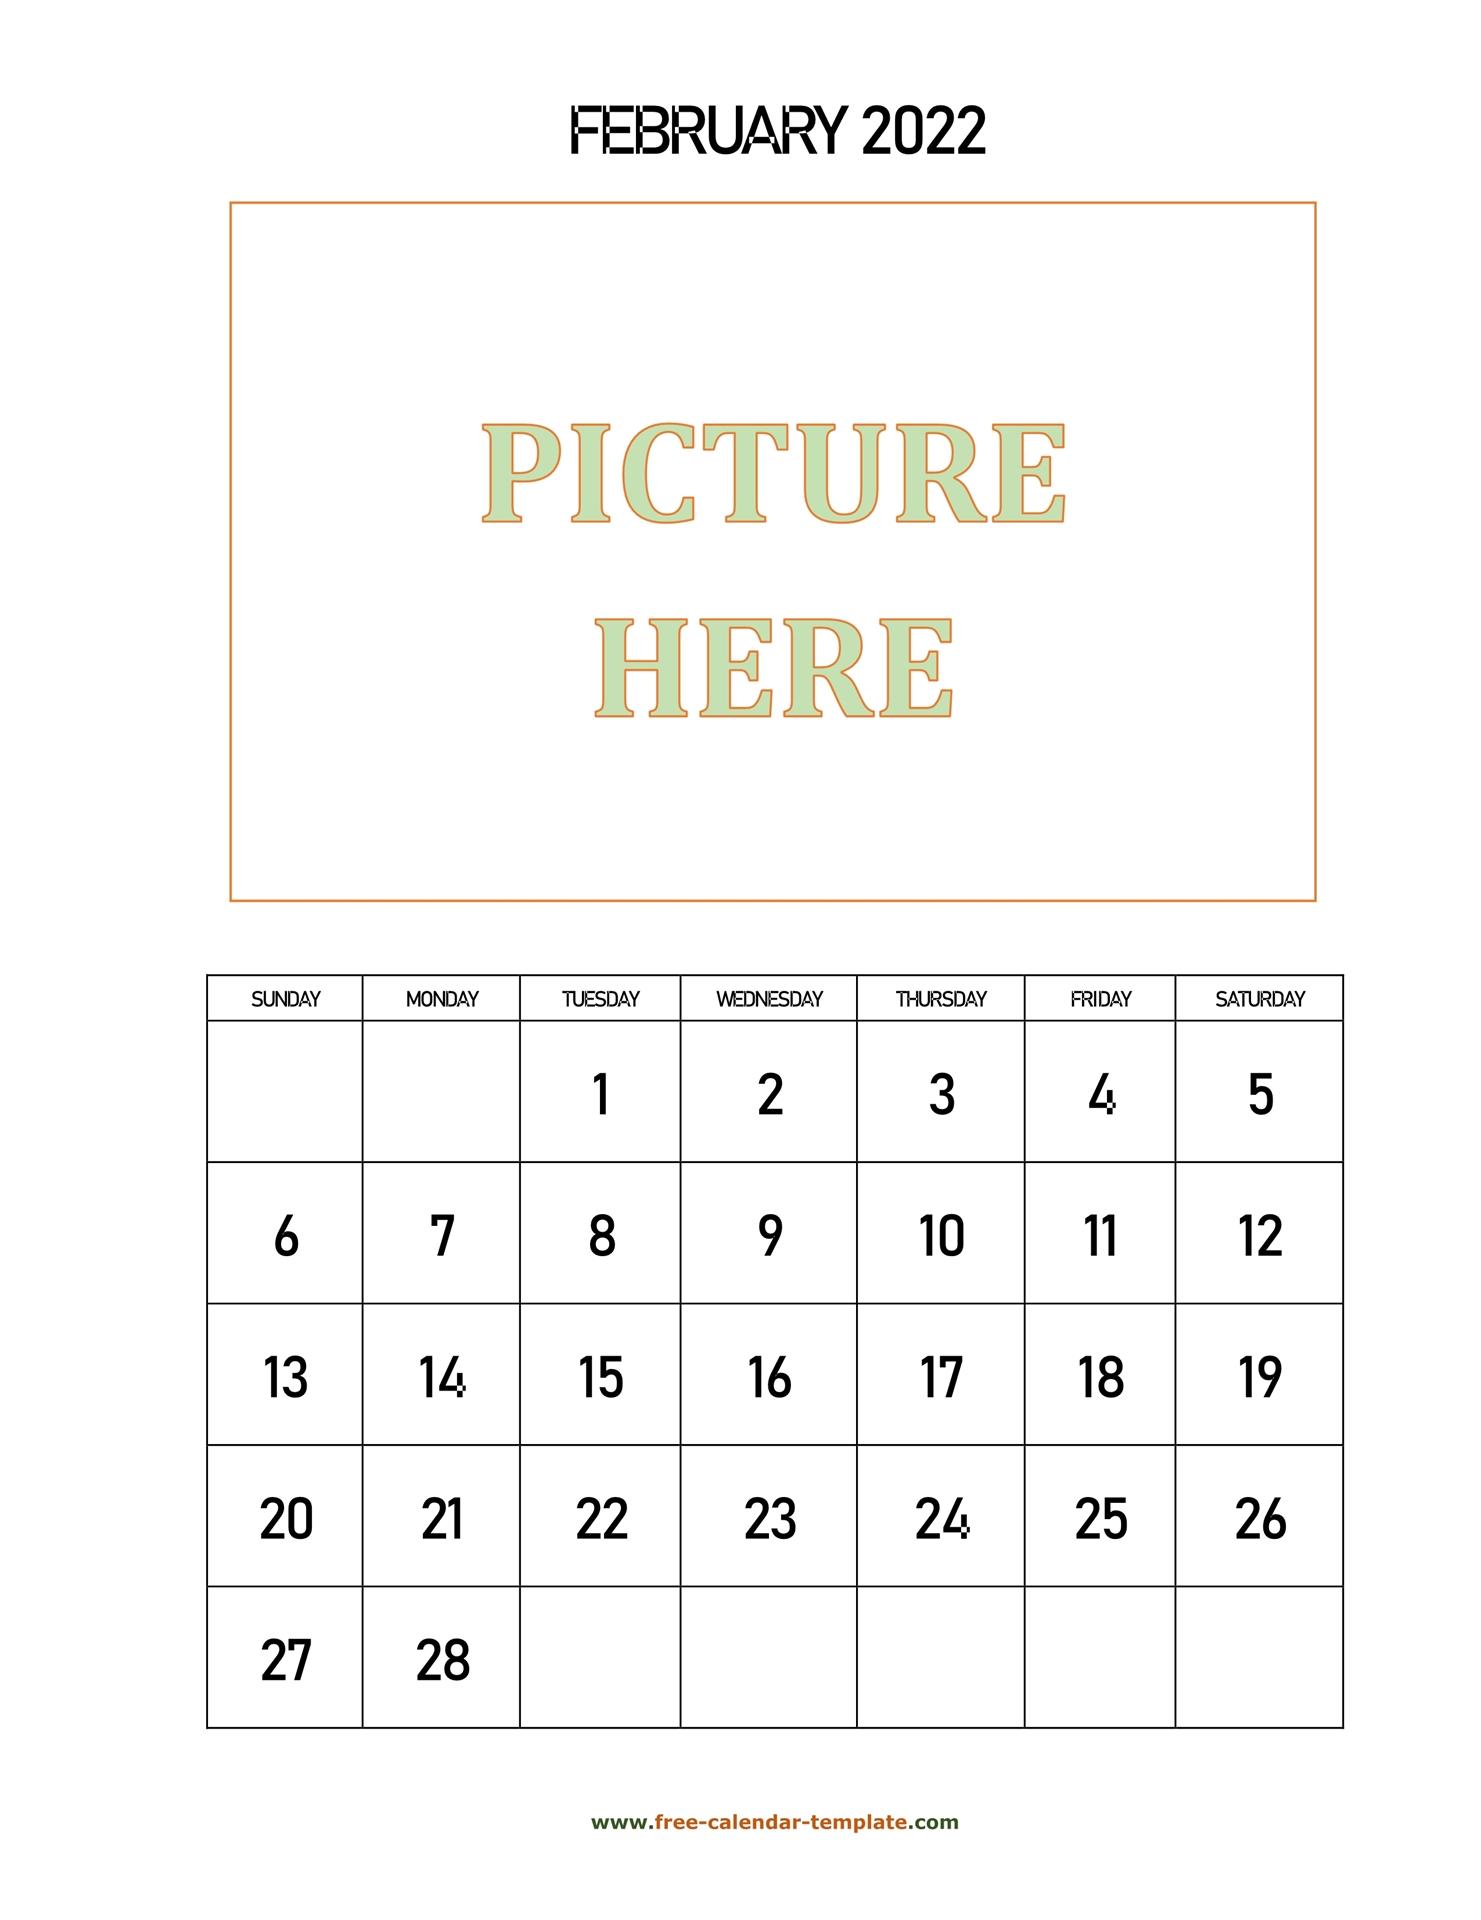 February Printable 2022 Calendar, Space For Add Picture Intended For Printable Calendar February 2022